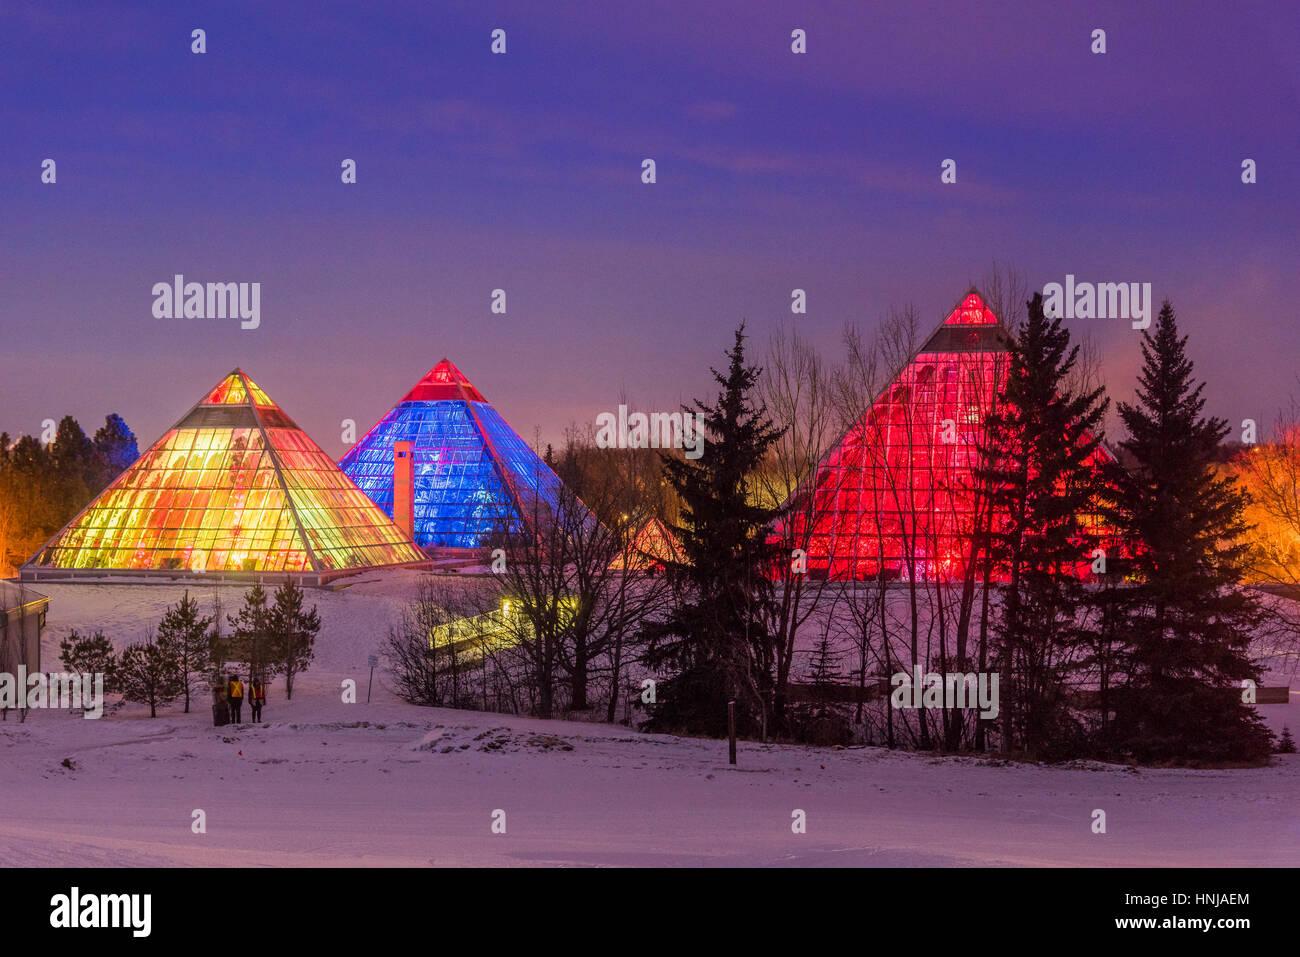 Iluminado Conservatorio Muttart pirámides, un jardín botánico en Edmonton, Alberta, Canadá Imagen De Stock